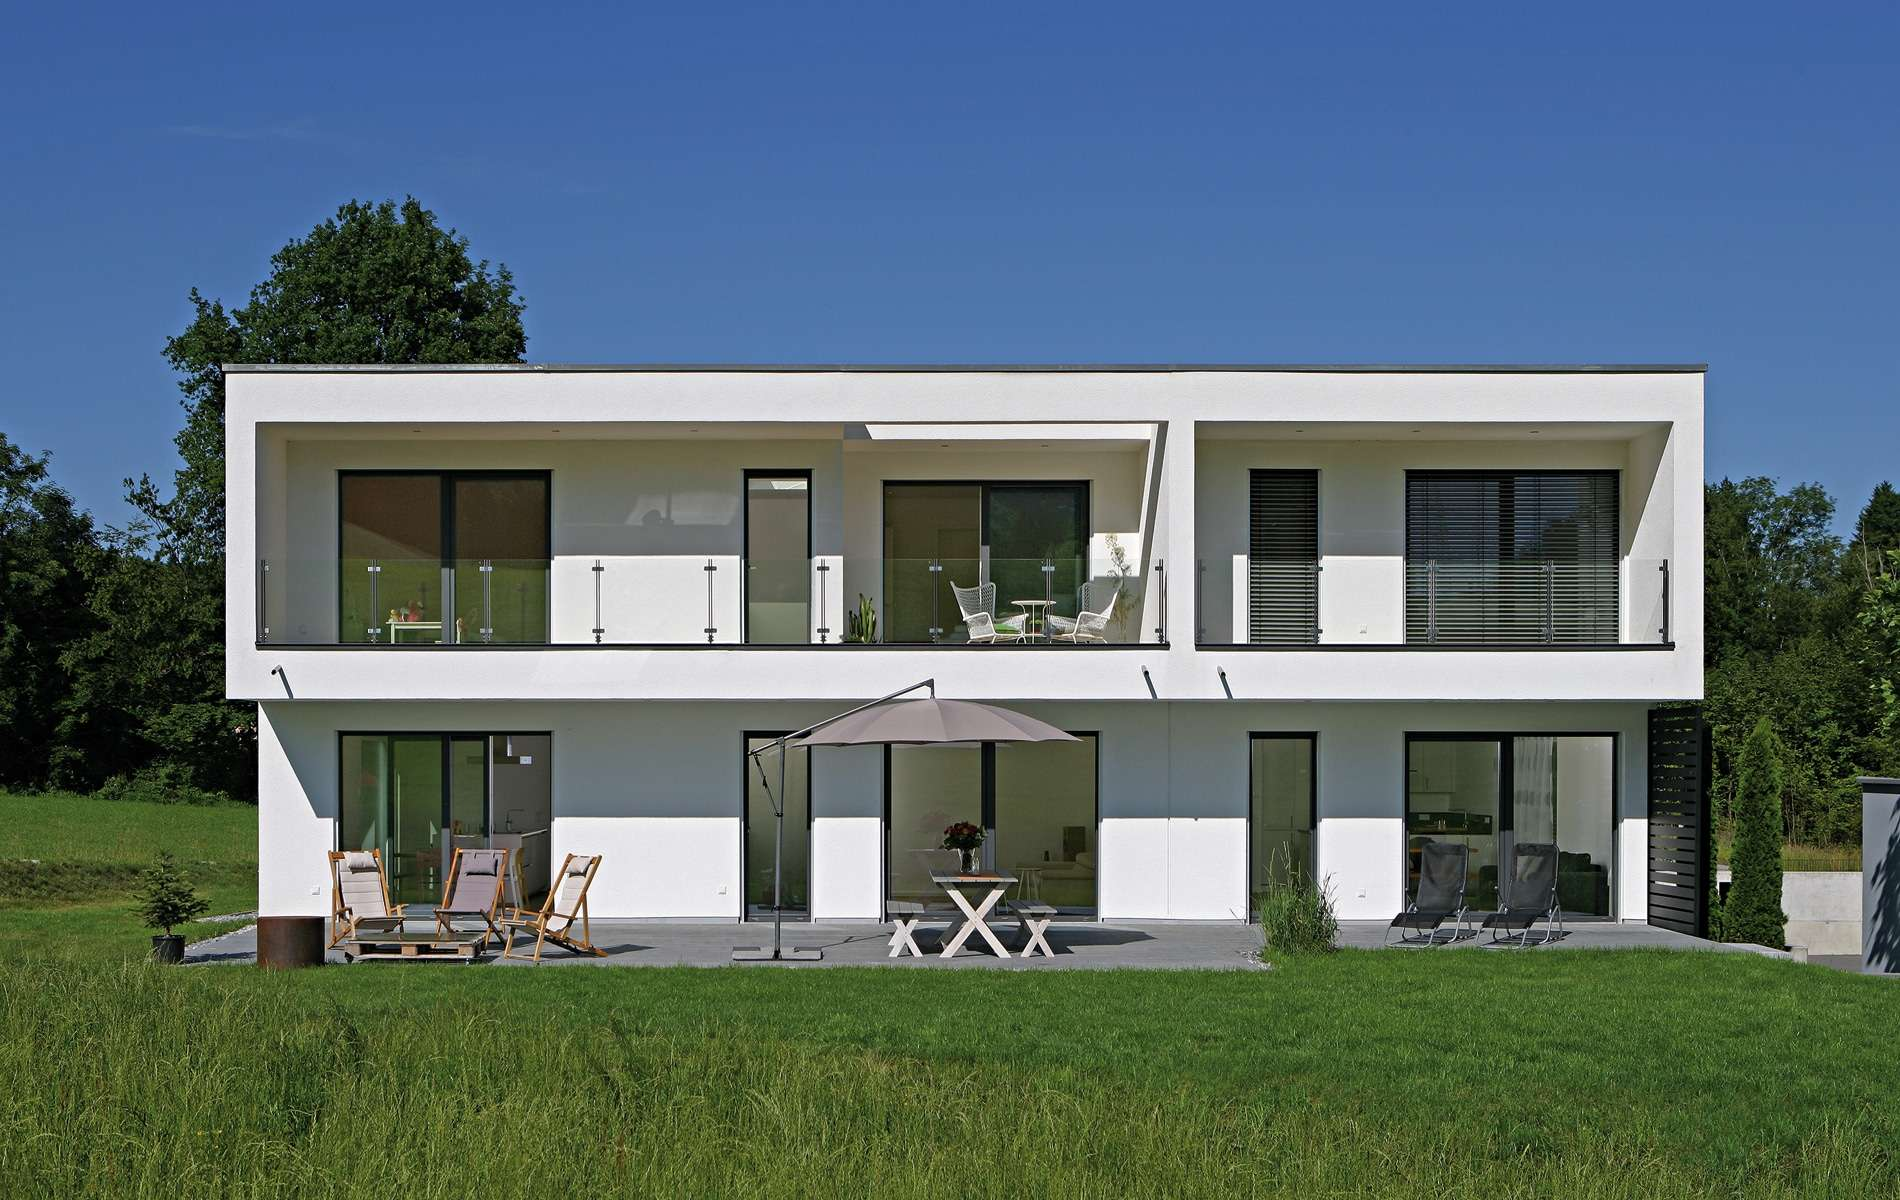 keitel haus haus ehrenbach. Black Bedroom Furniture Sets. Home Design Ideas